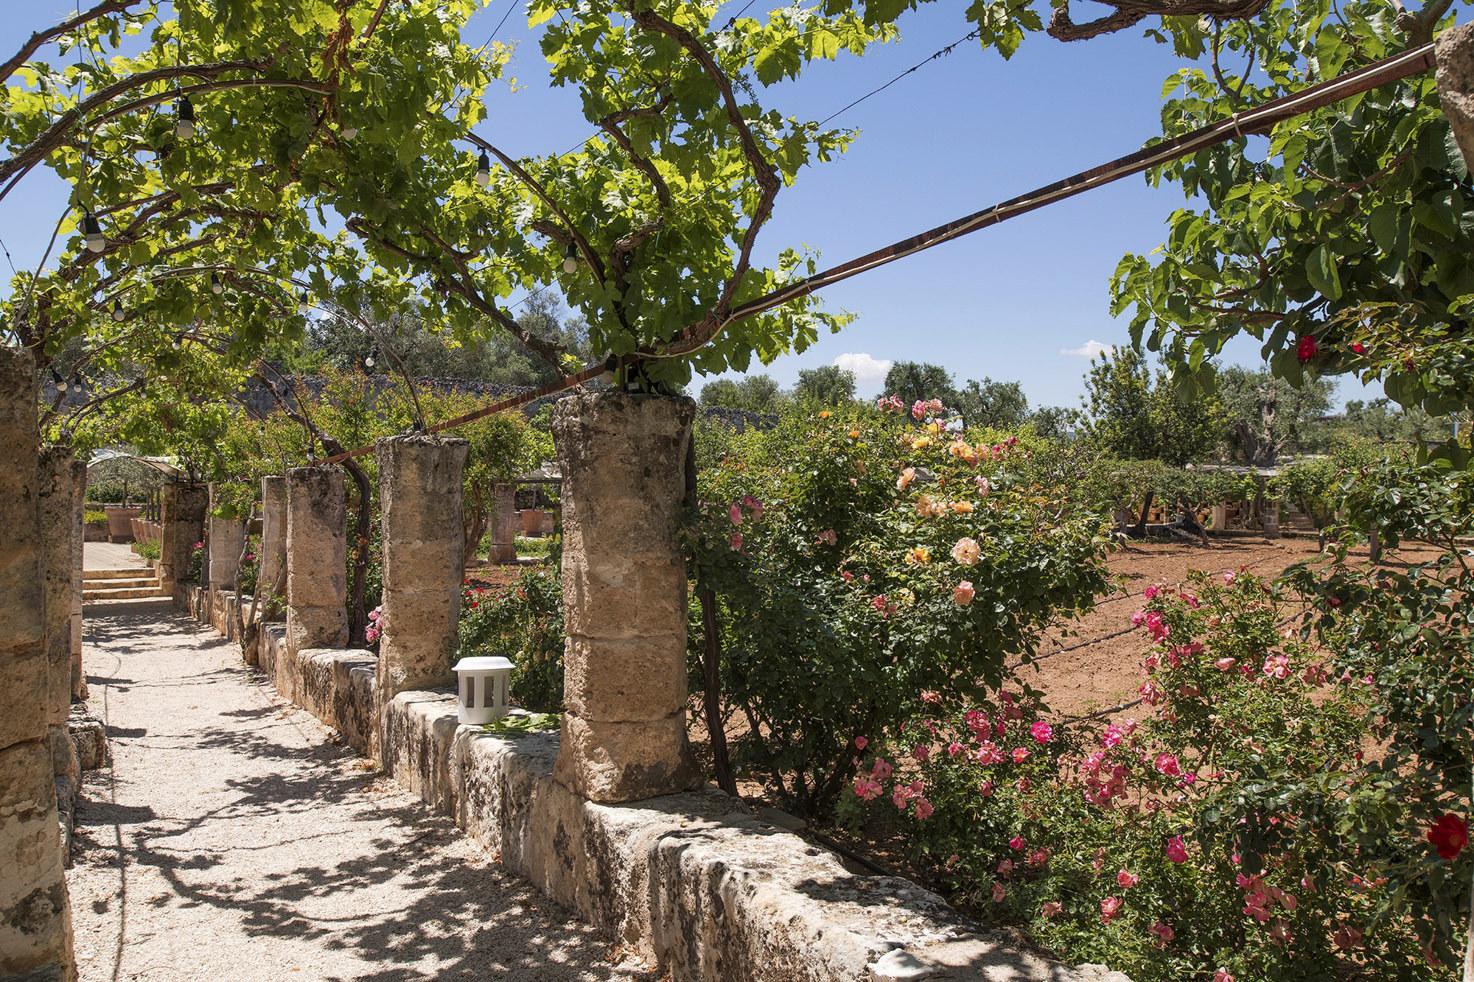 Torre Coccaro ancient gardens